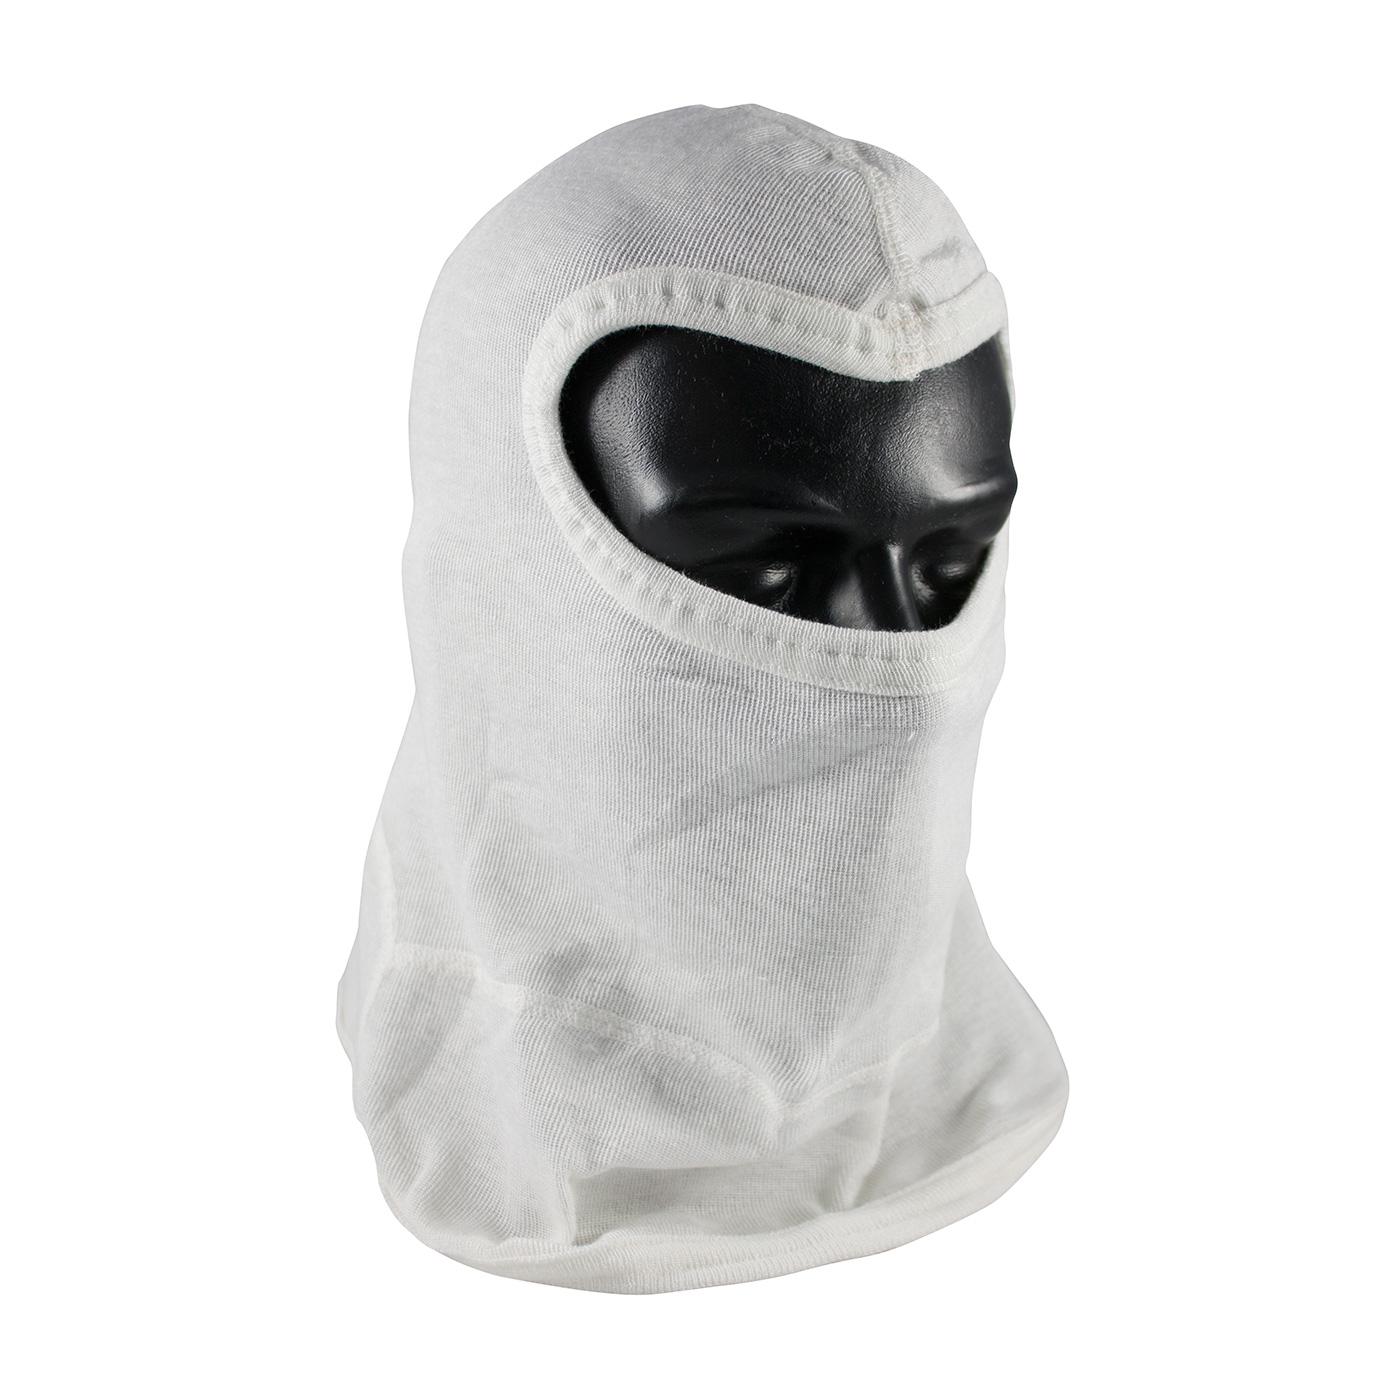 Single-Layer Nomex® Balaclava with Bib - Slit Eye, White, OS